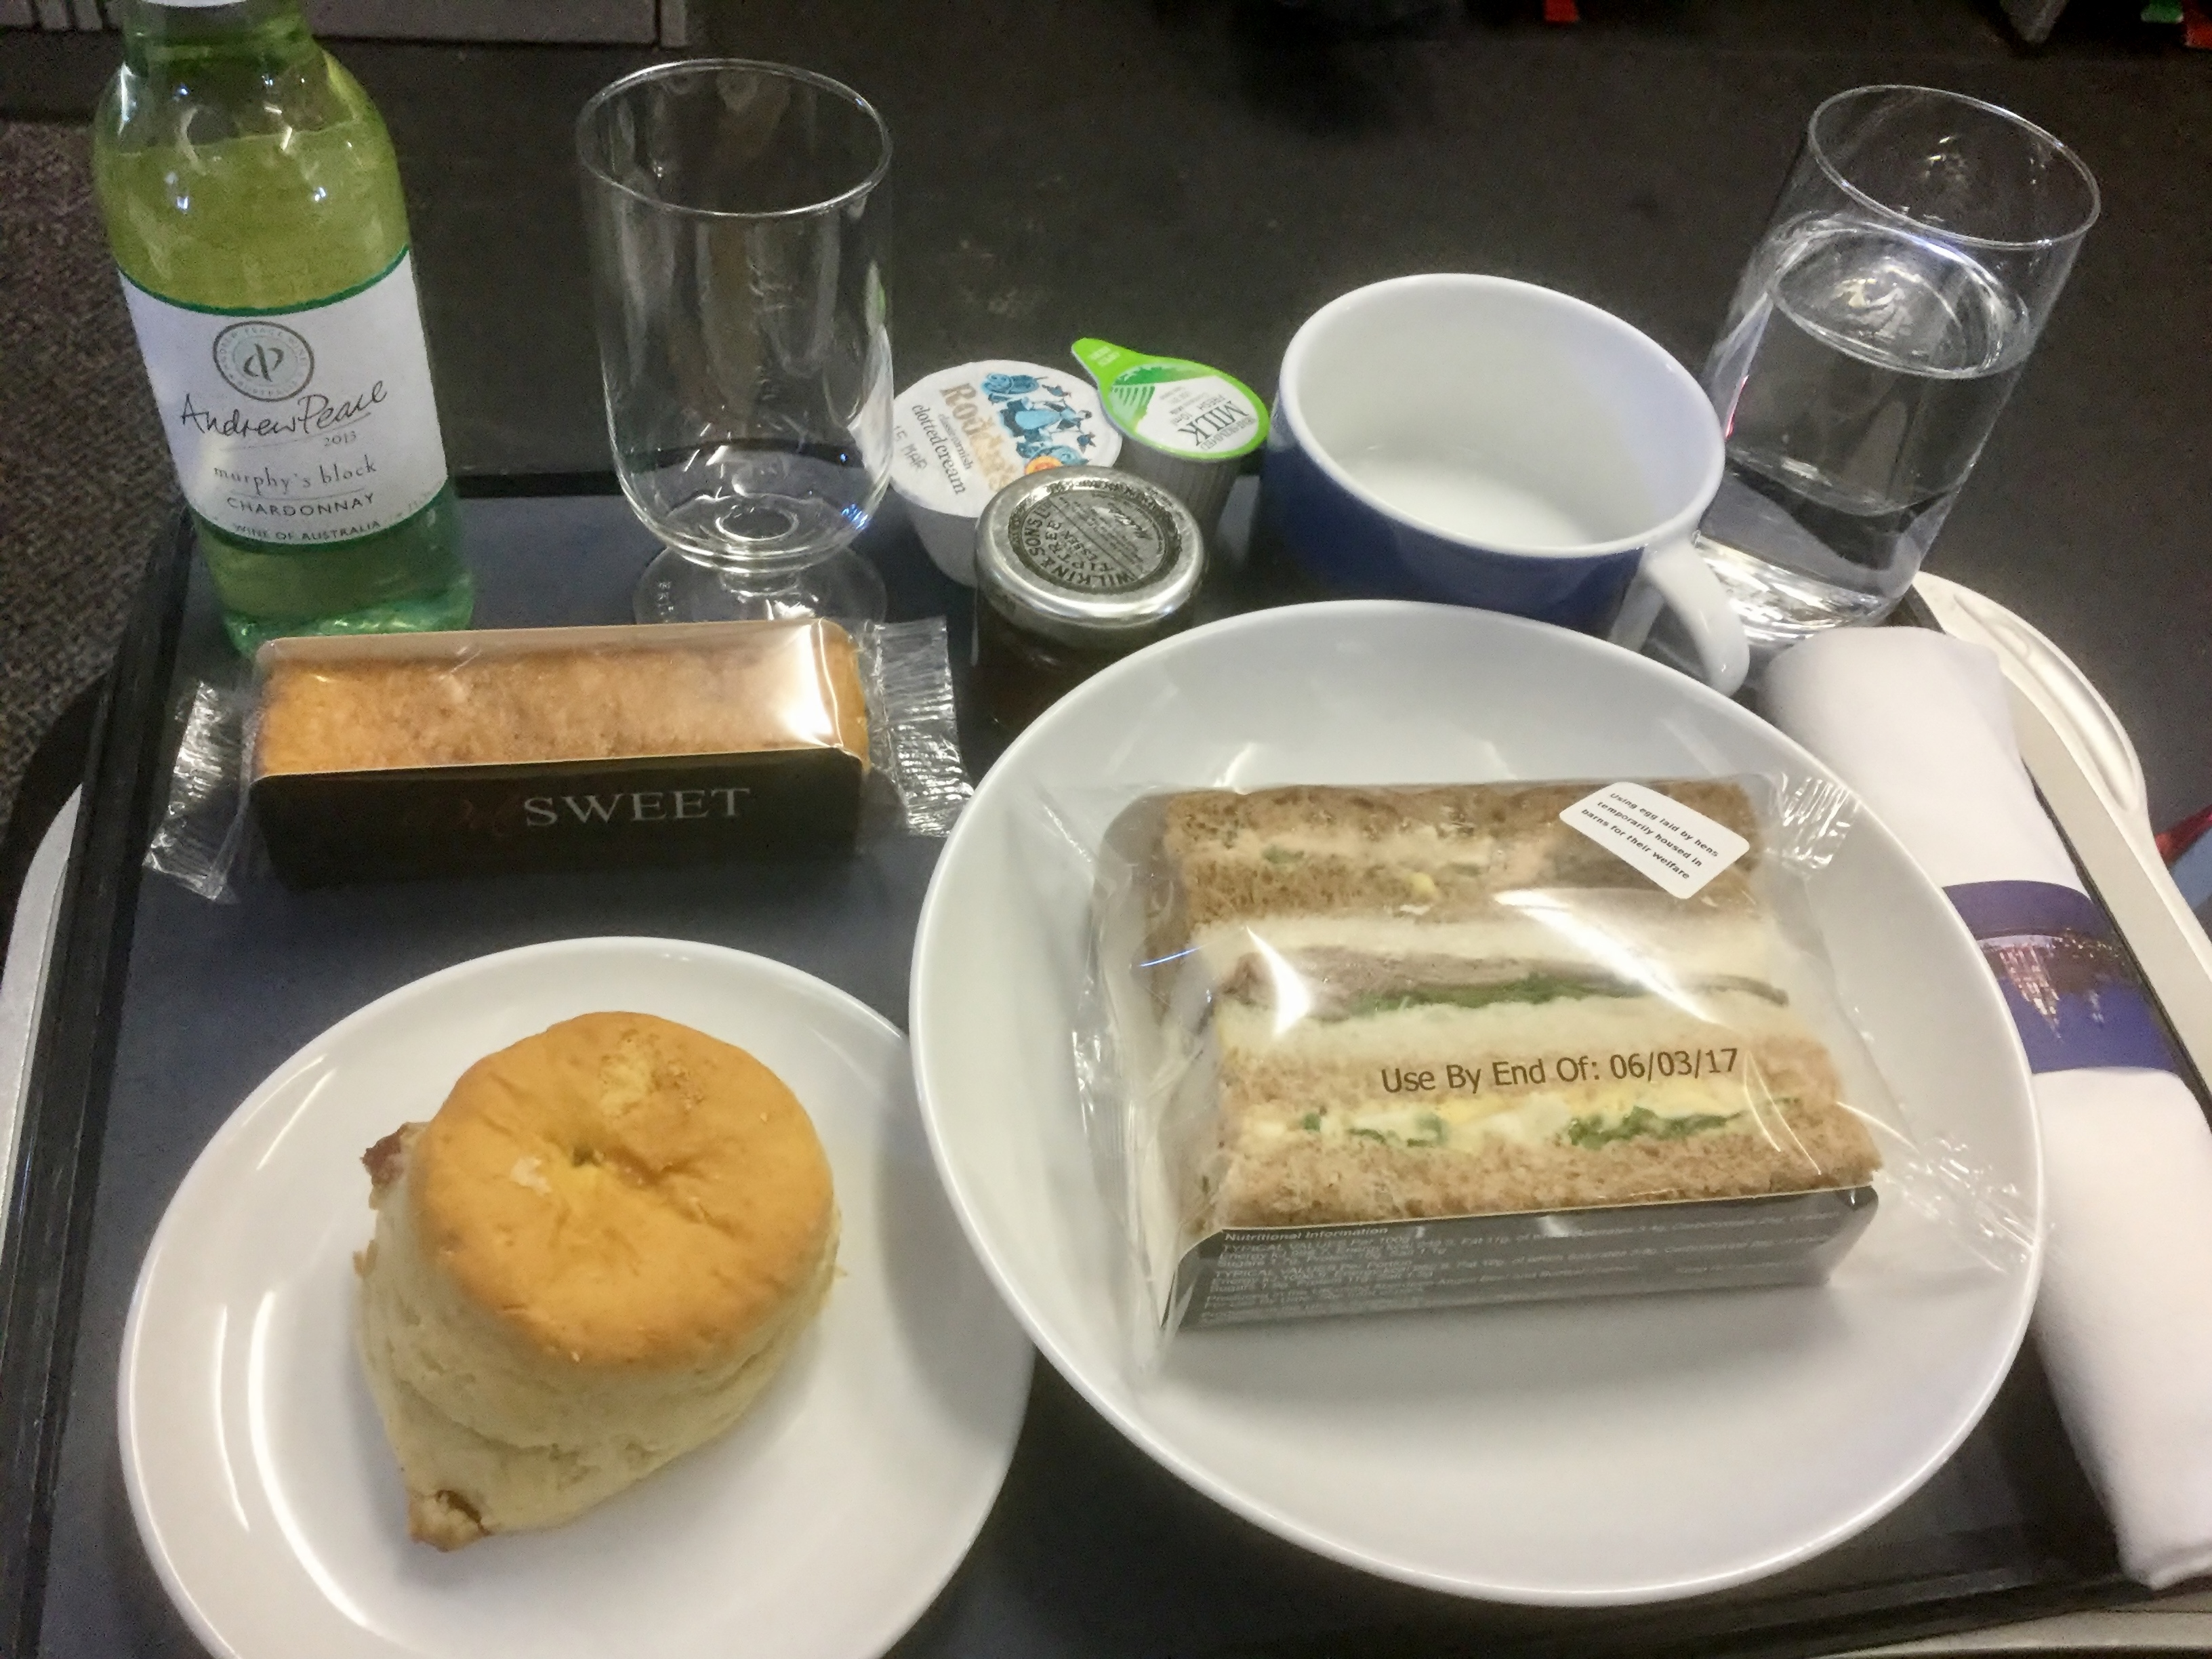 Afternoon tea in British Airways business class Club Europe